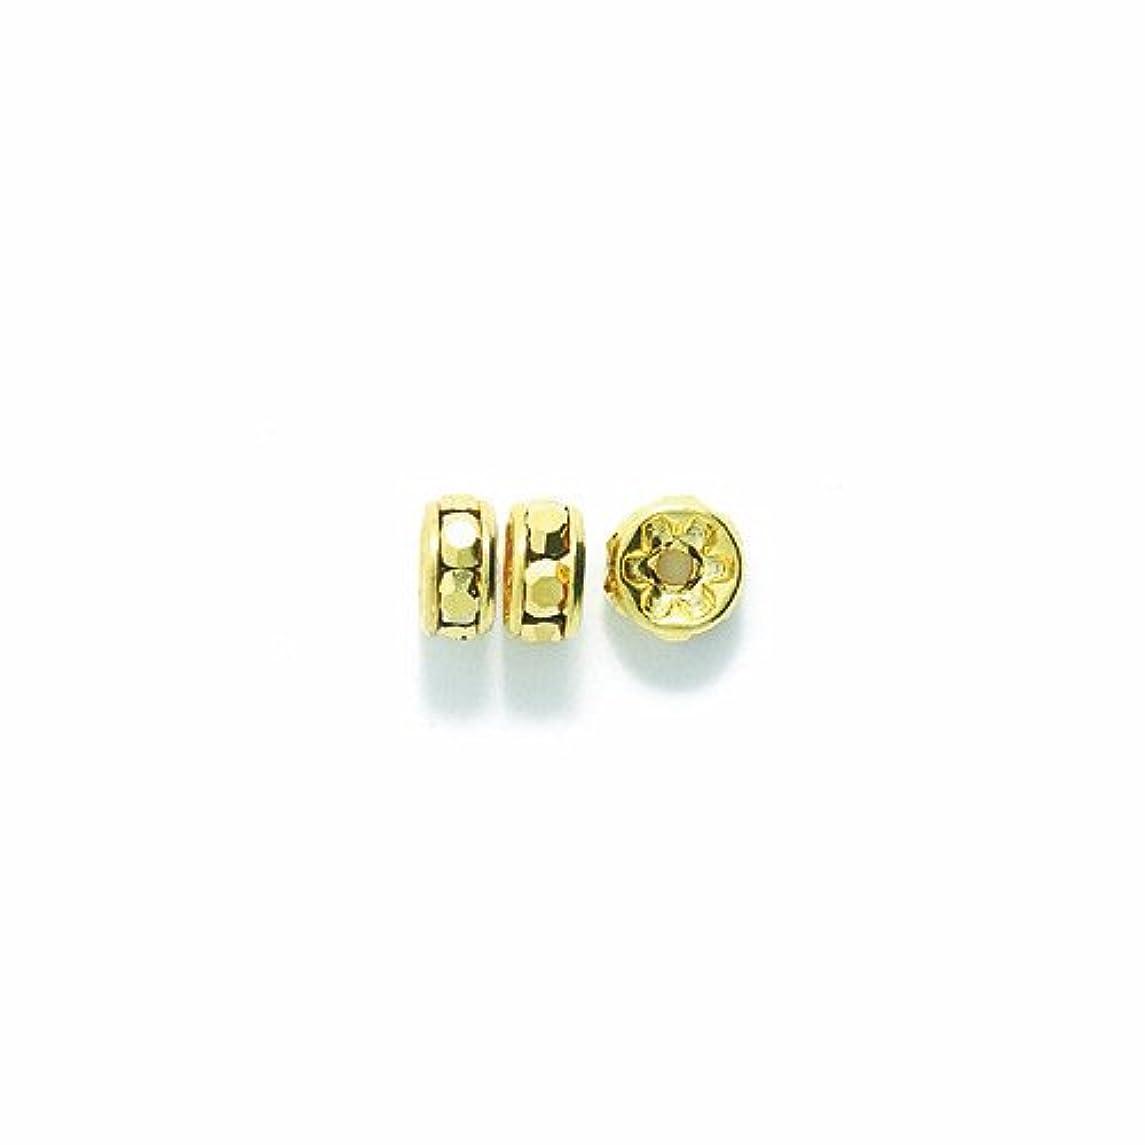 Preciosa Rhinestone Rondelle Beads, 5mm, Aurum Gold, 48- pack